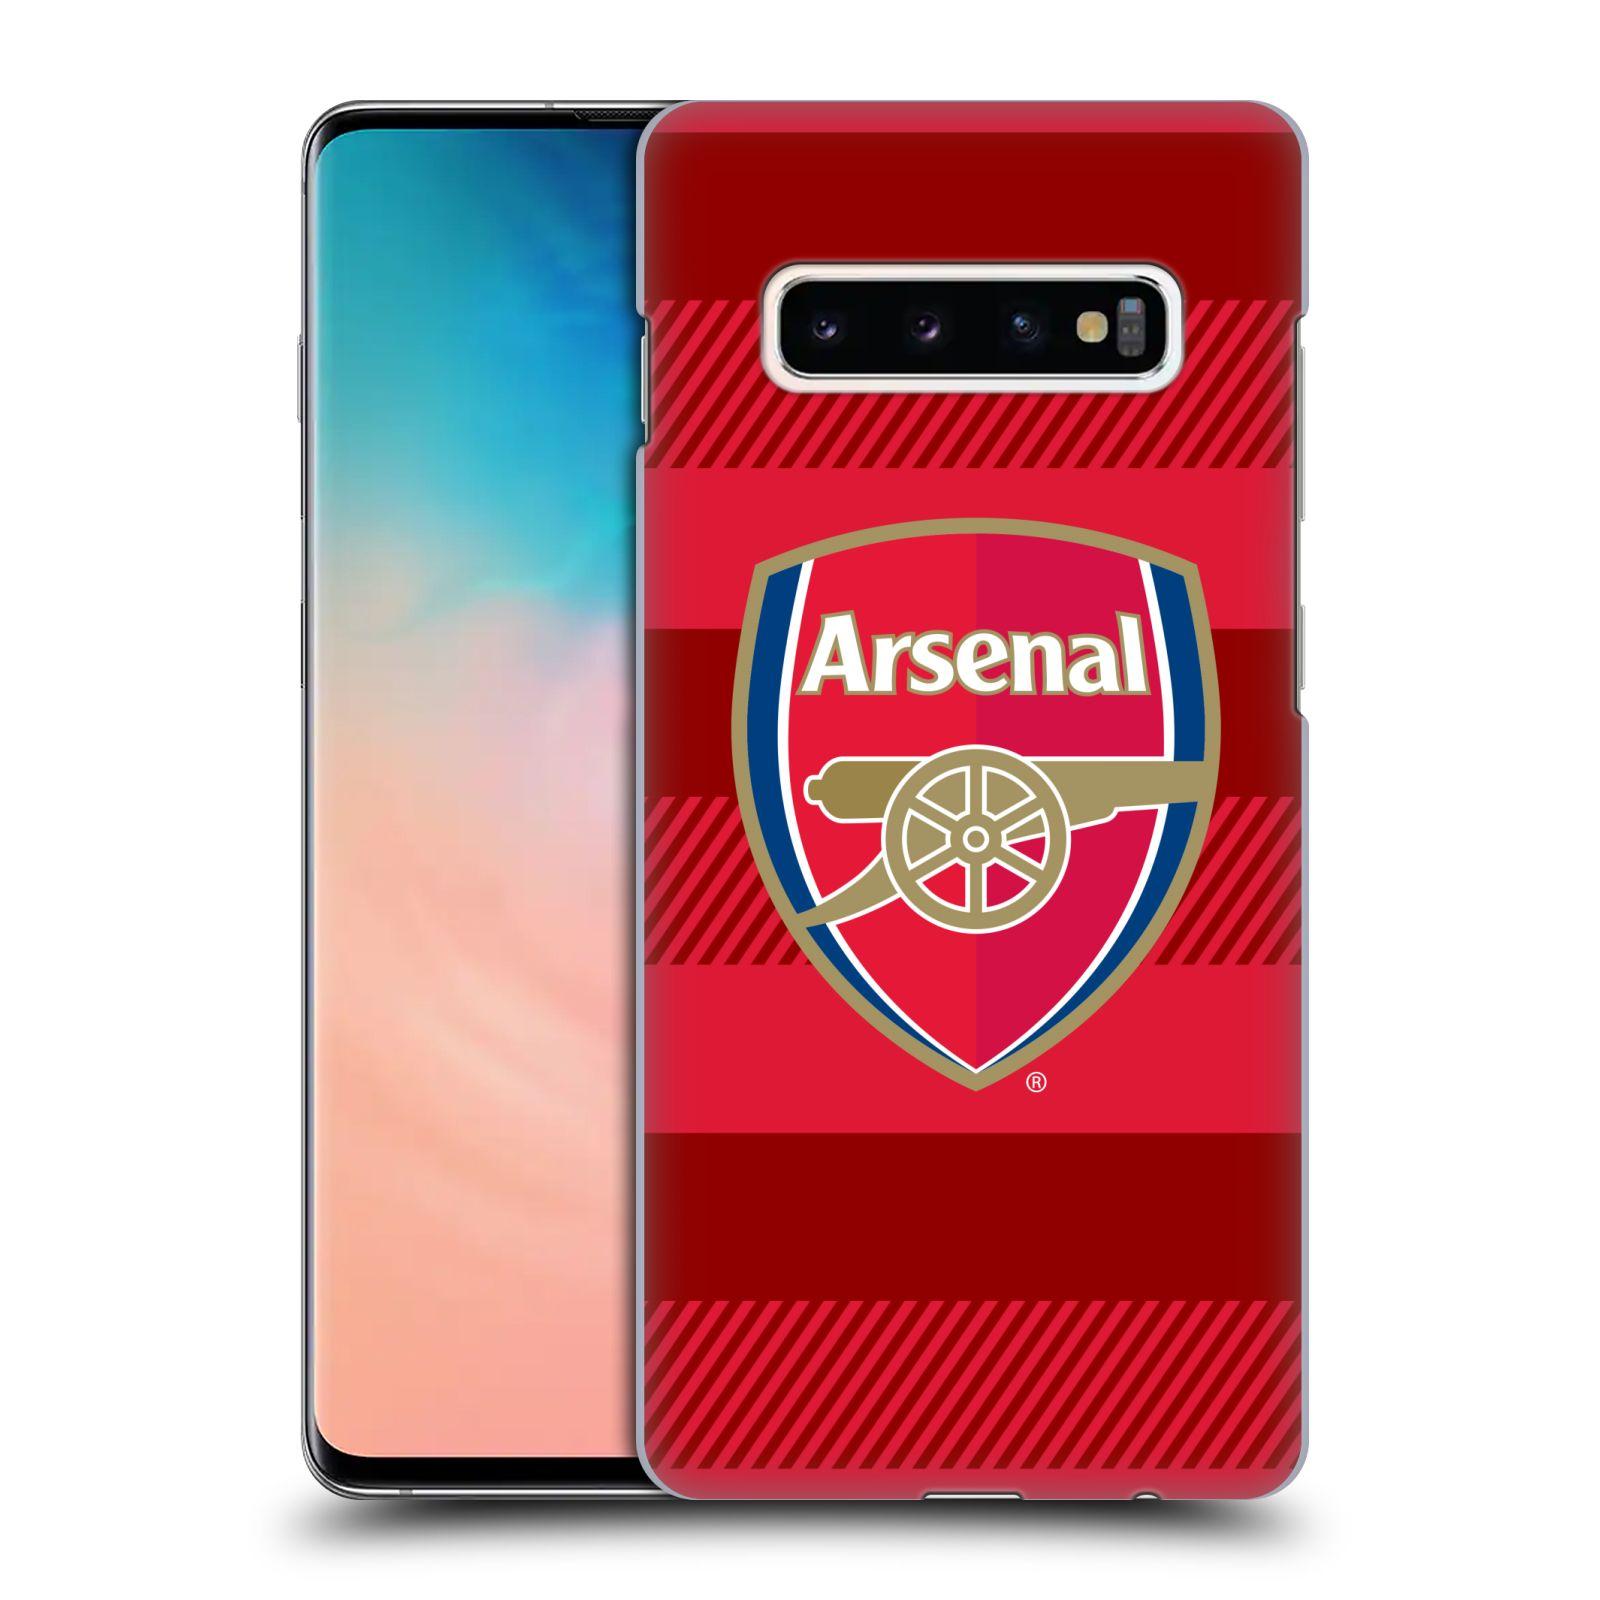 Plastové pouzdro na mobil Samsung Galaxy S10 Plus - Head Case - Arsenal FC - Logo s pruhy